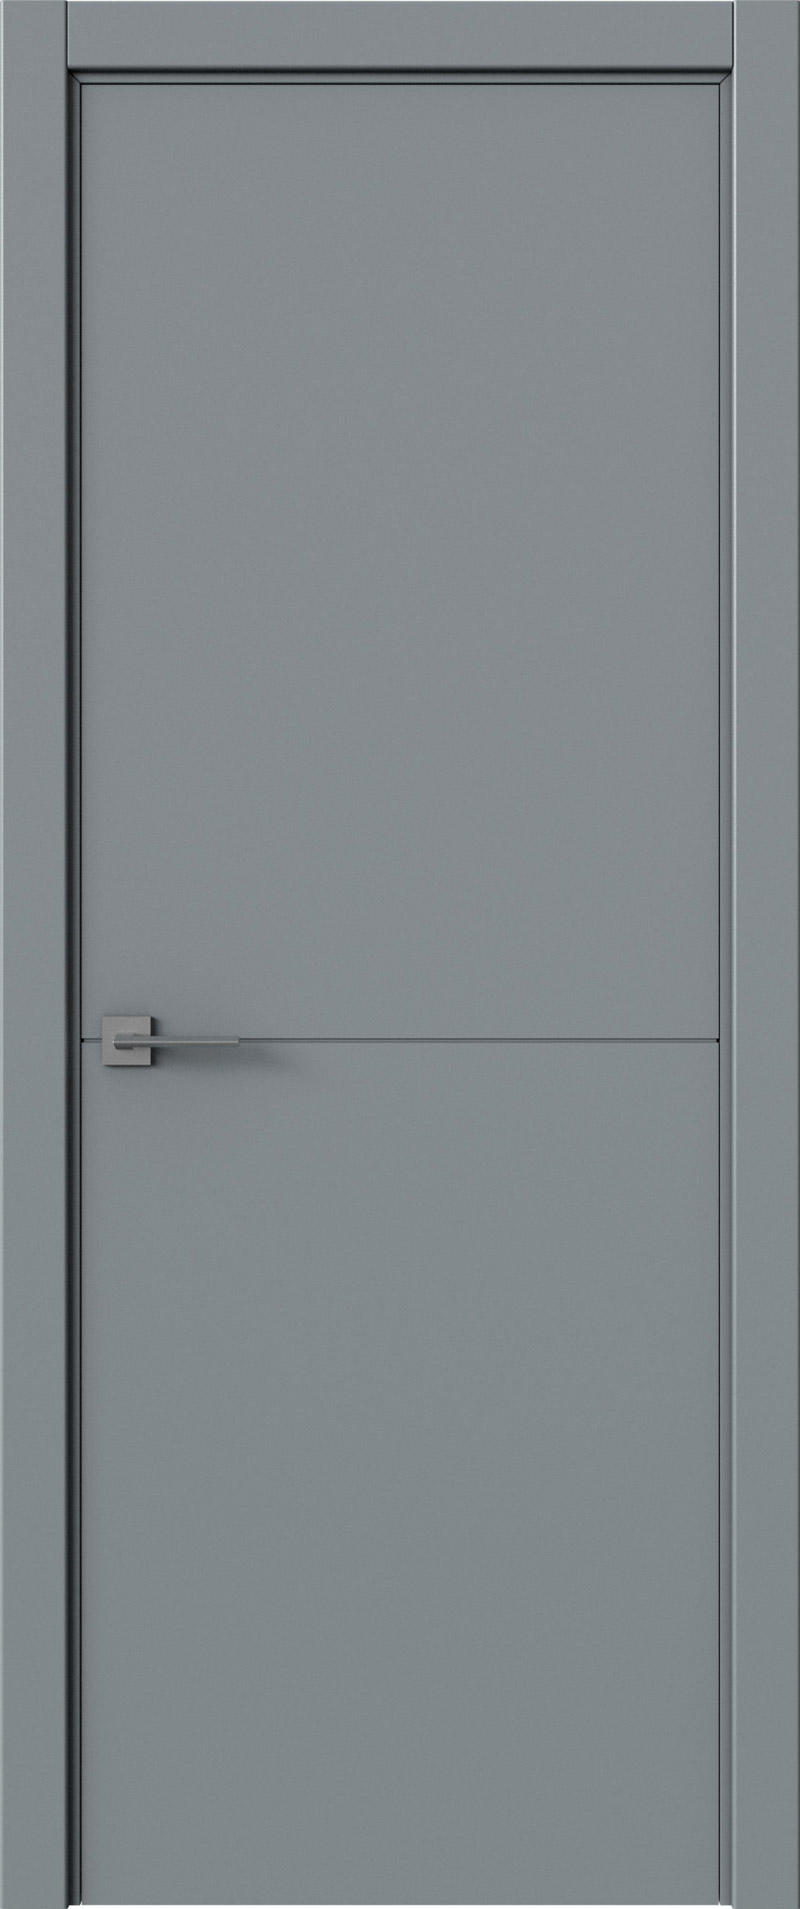 Tivoli Б-2 цвет - Серебристо-серая эмаль (RAL 7045) Без стекла (ДГ)